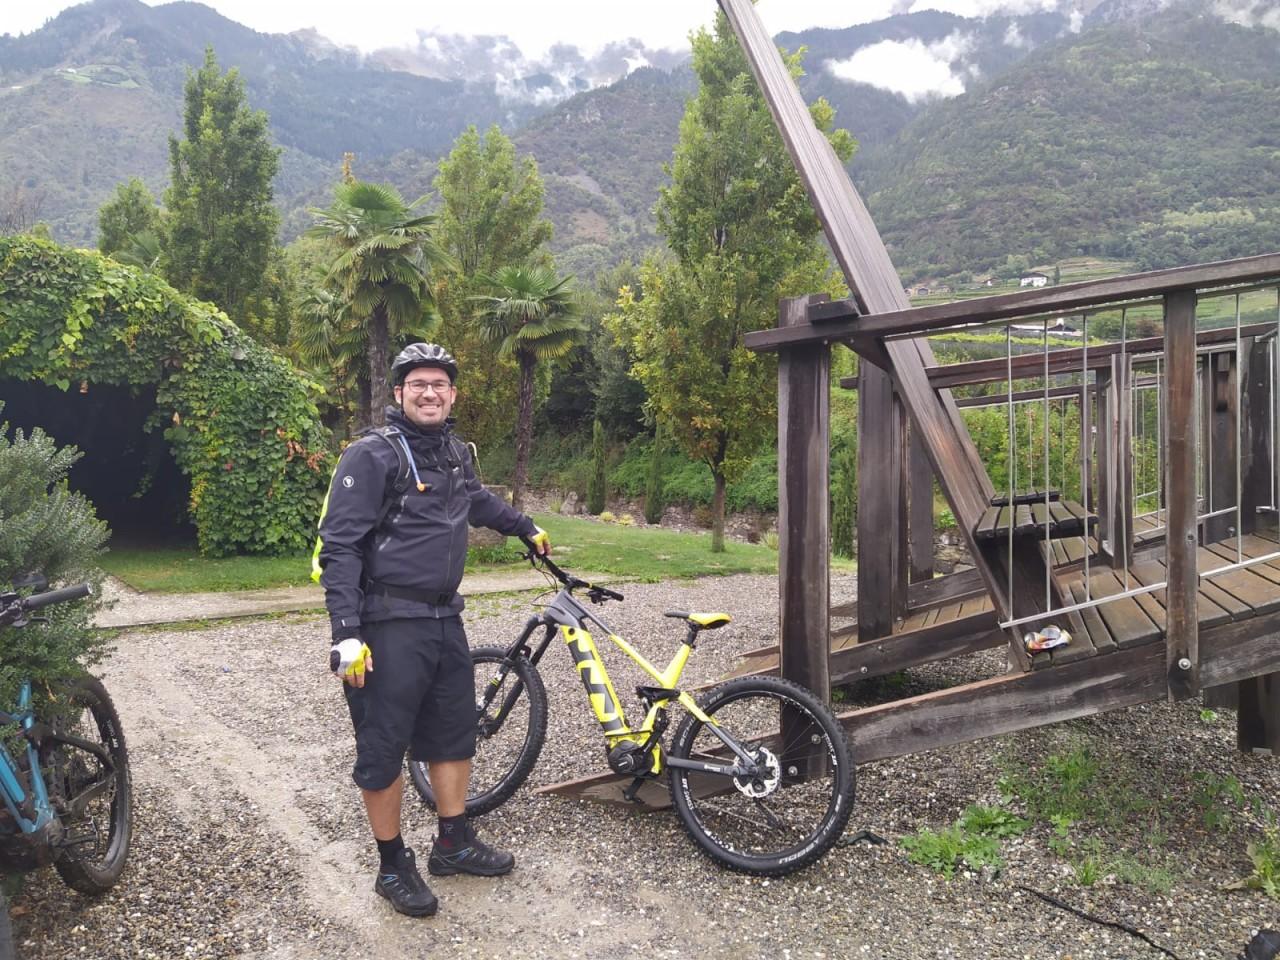 Gerhardmitbike14kl6bmMMhcBC